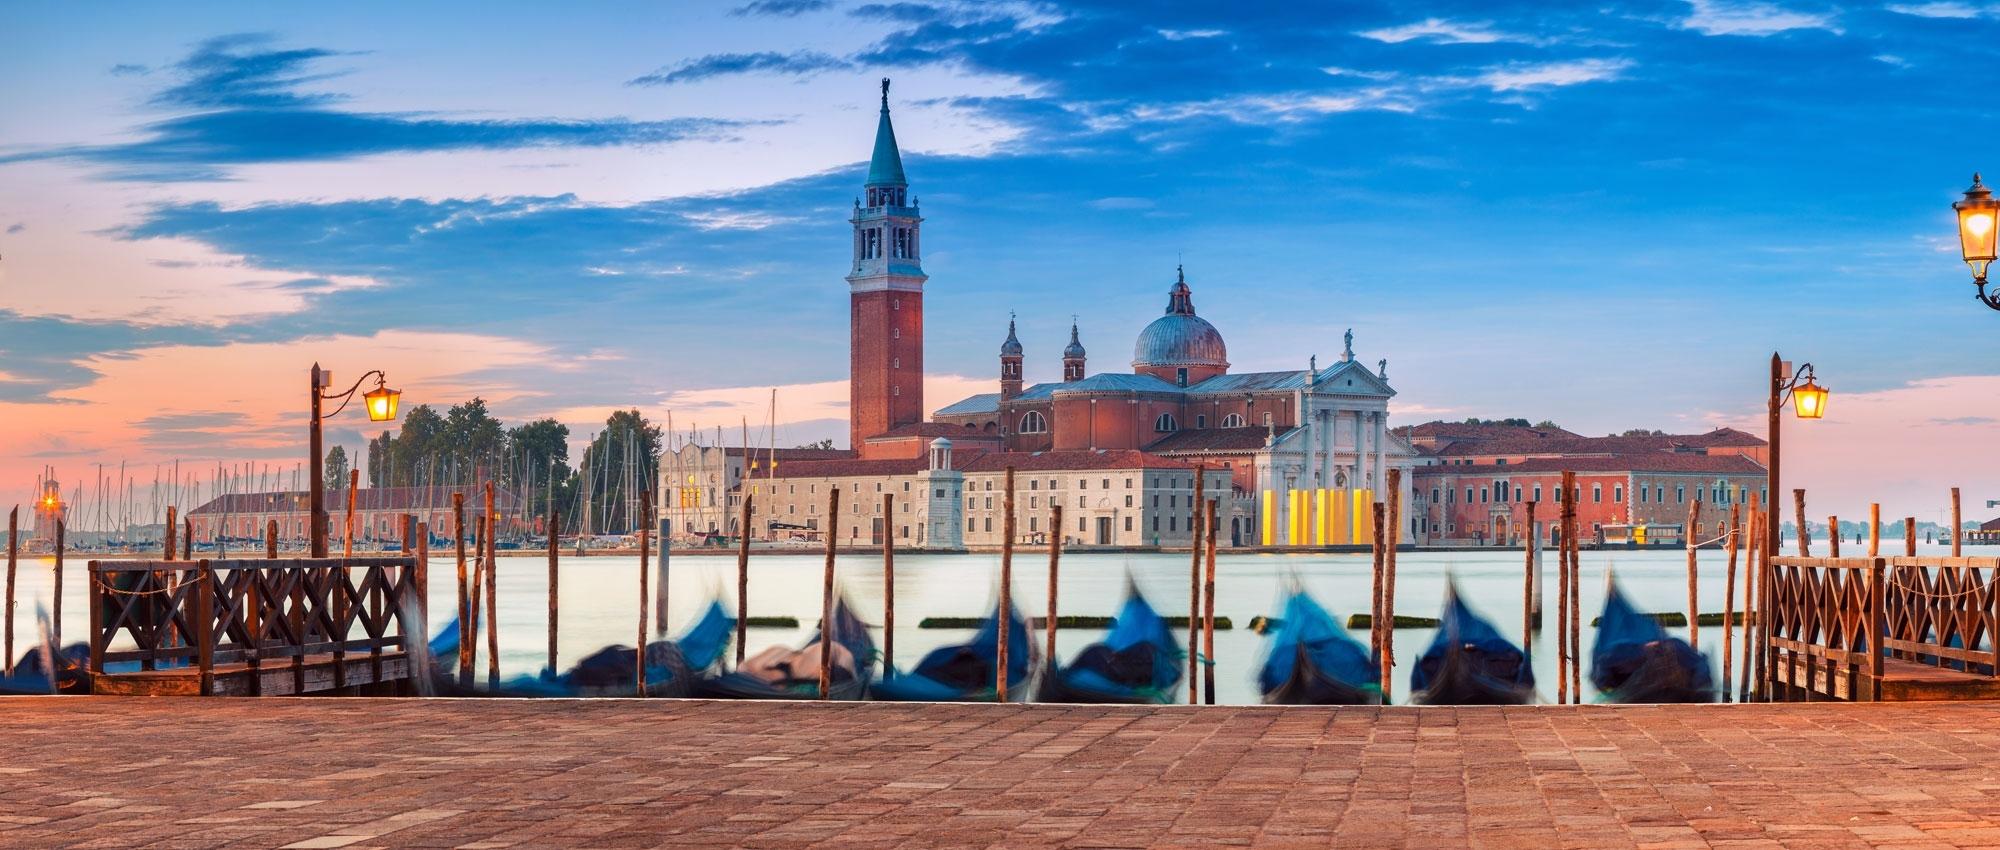 Noleggio auto di lusso Venezia